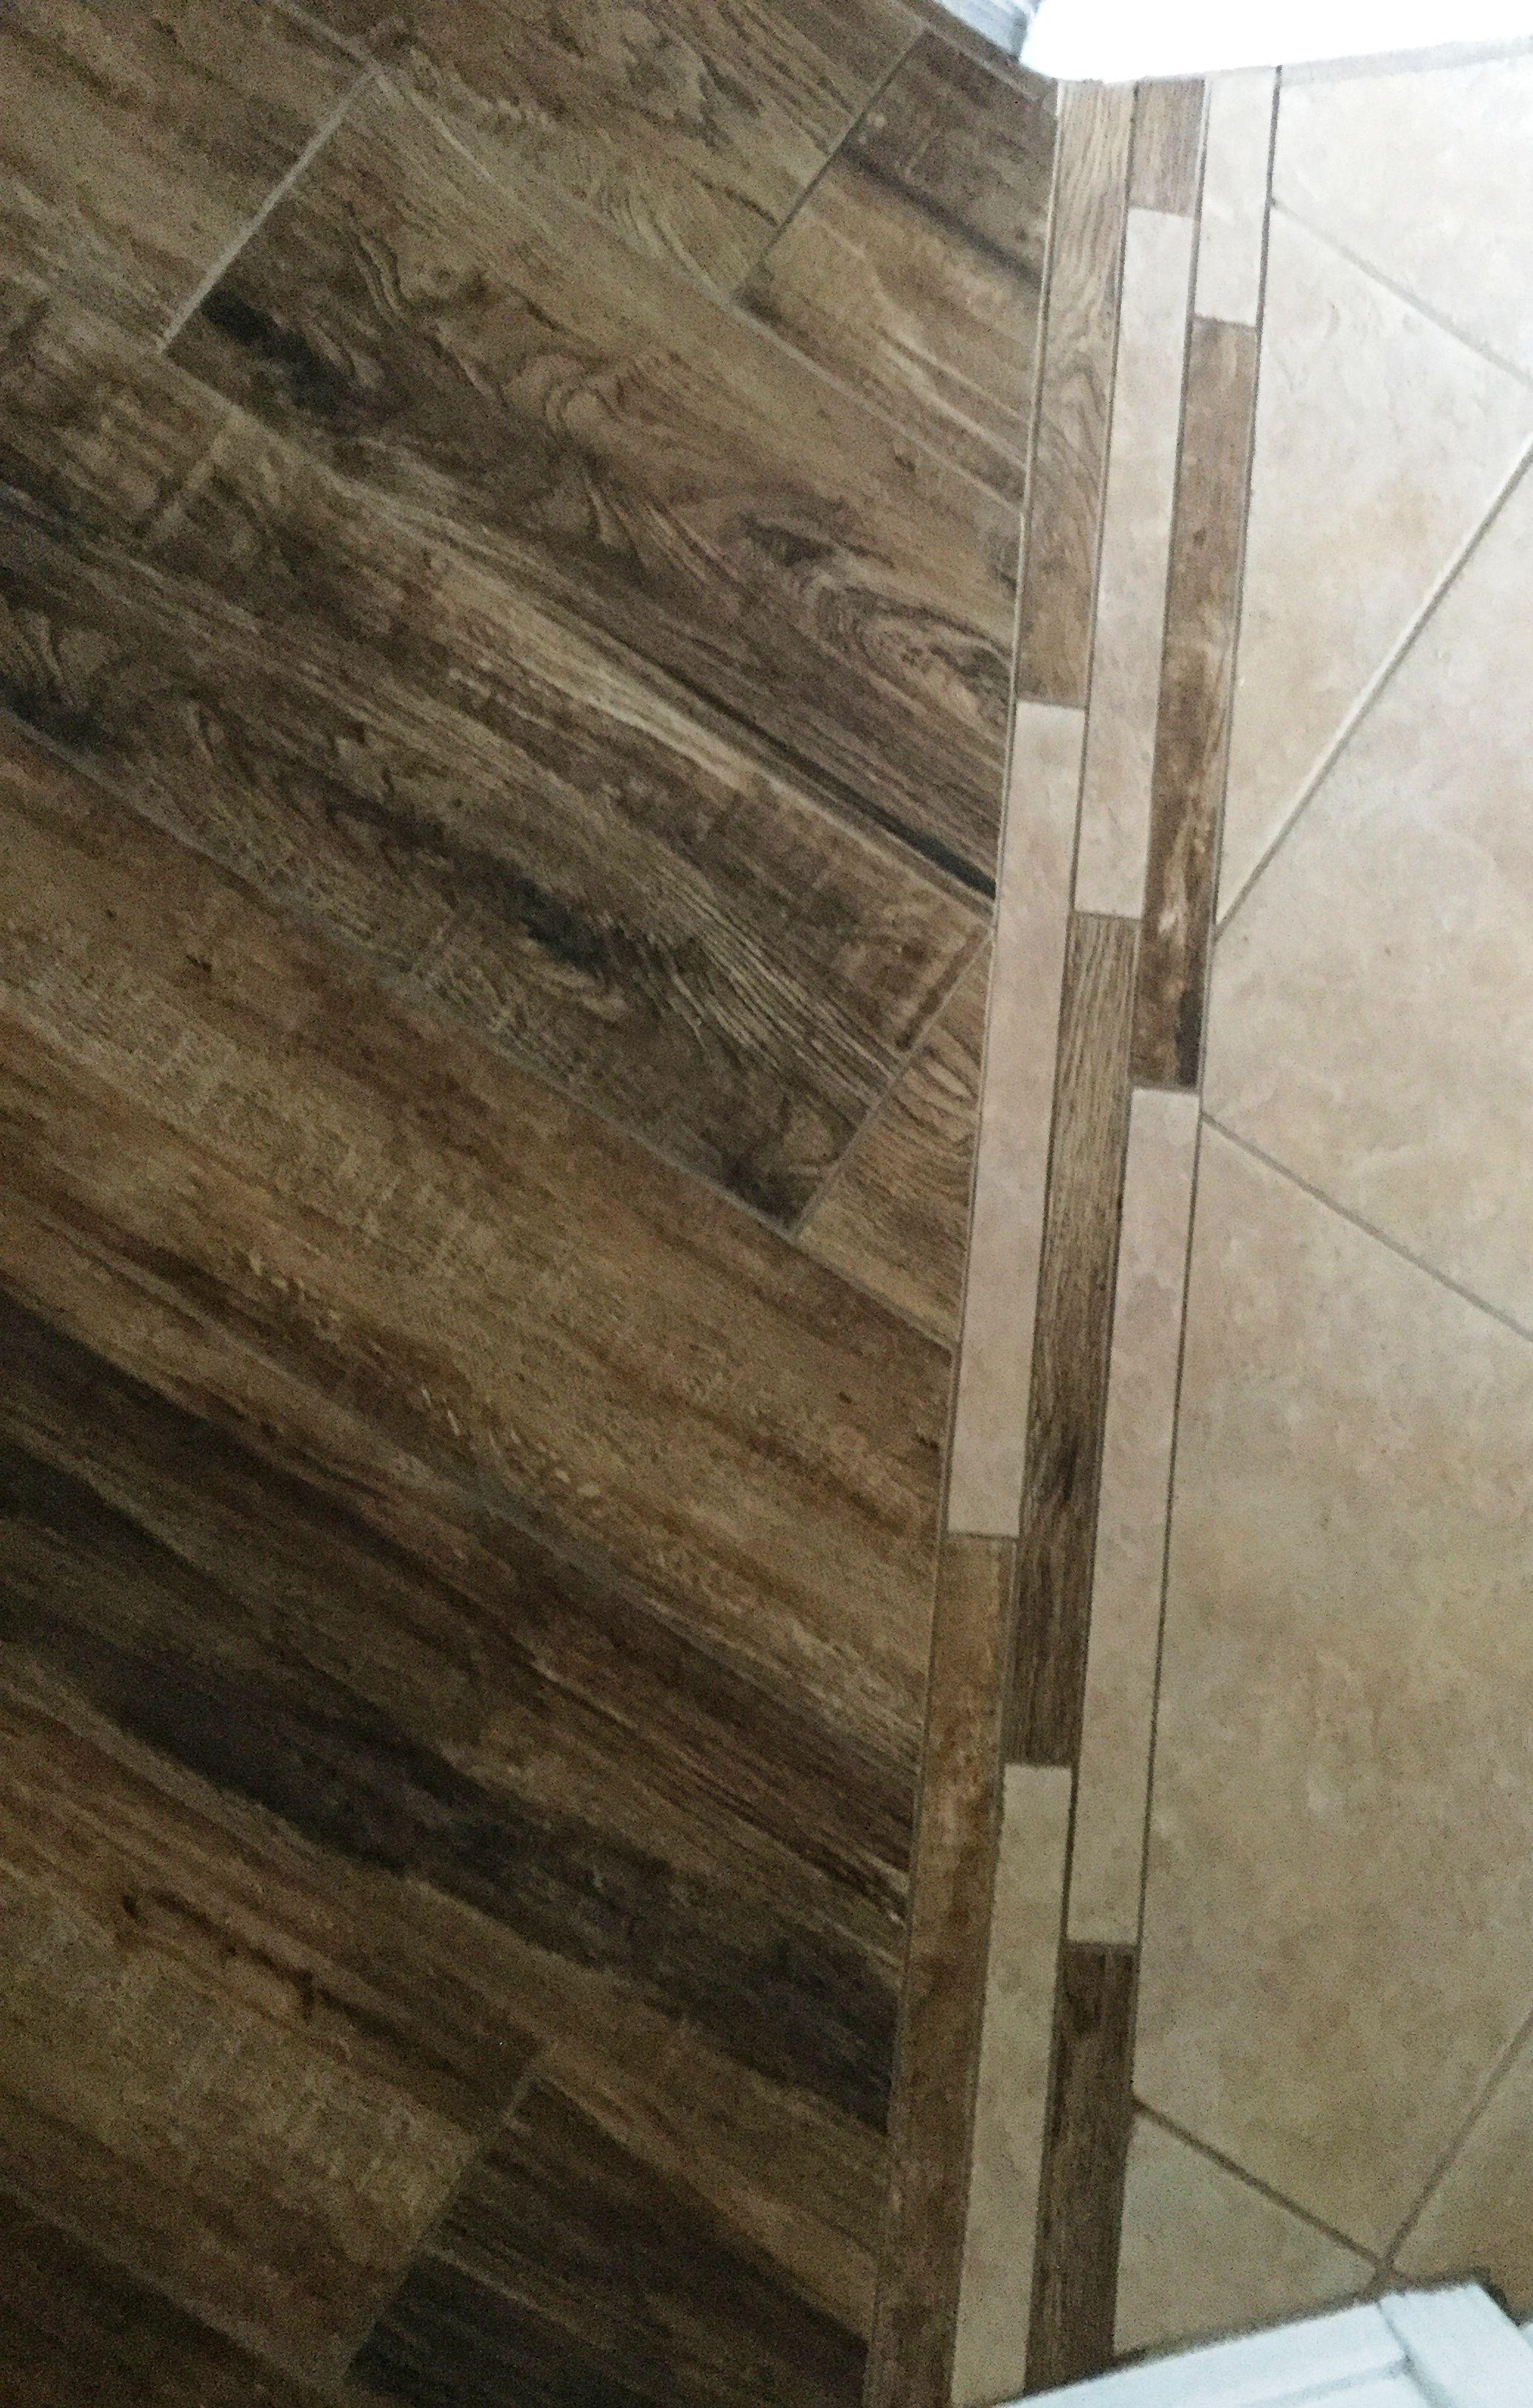 Home Remodeling Gallery Ideas Kitchen Bathroom Flooring Basement Remodeling Transition Flooring Kitchen Flooring